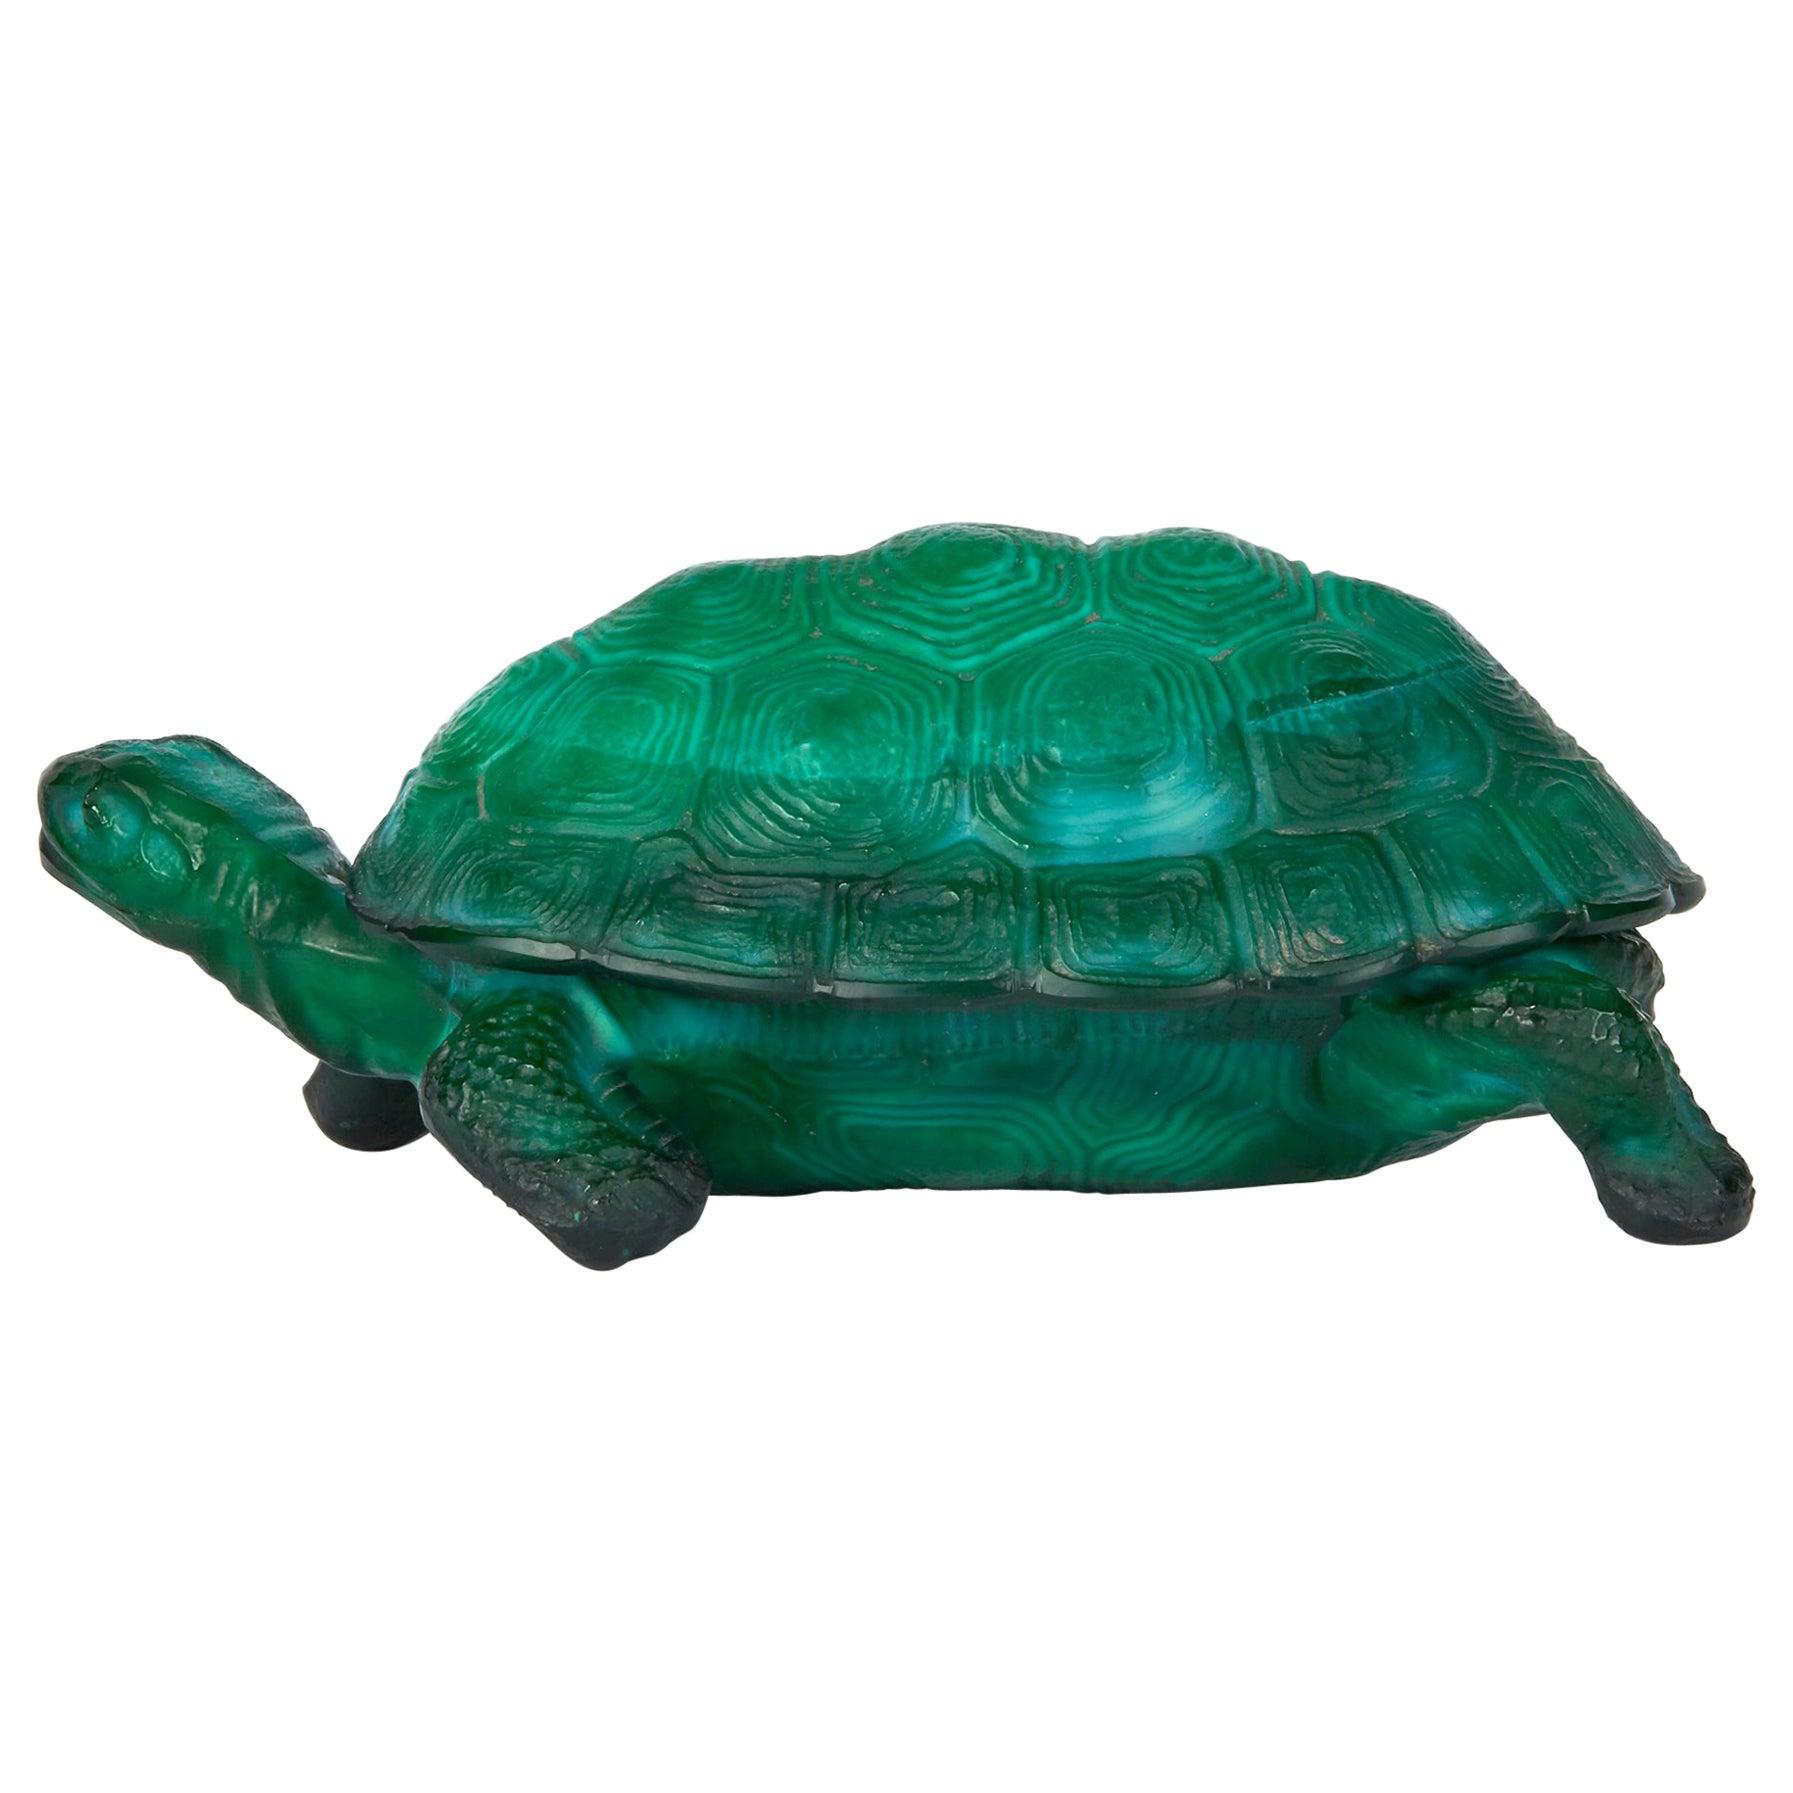 Curt Schlevogt Bohemian Art Deco Malachite Glass Tortoise Container